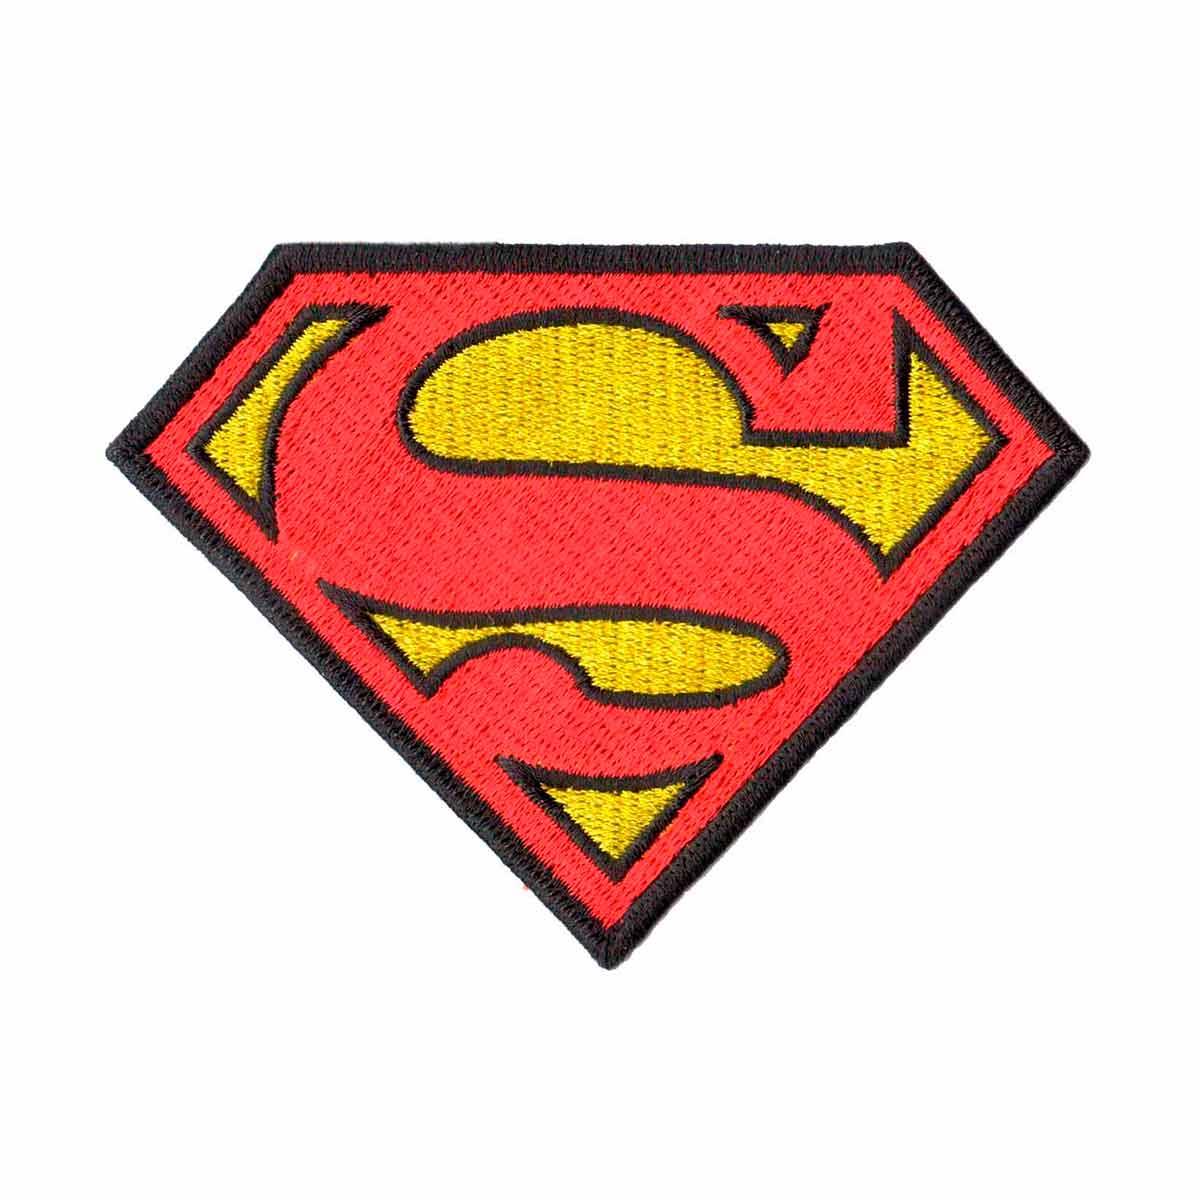 Patch Bordado - Super Homem Superman DV80279-279  - Talysmã Bordados